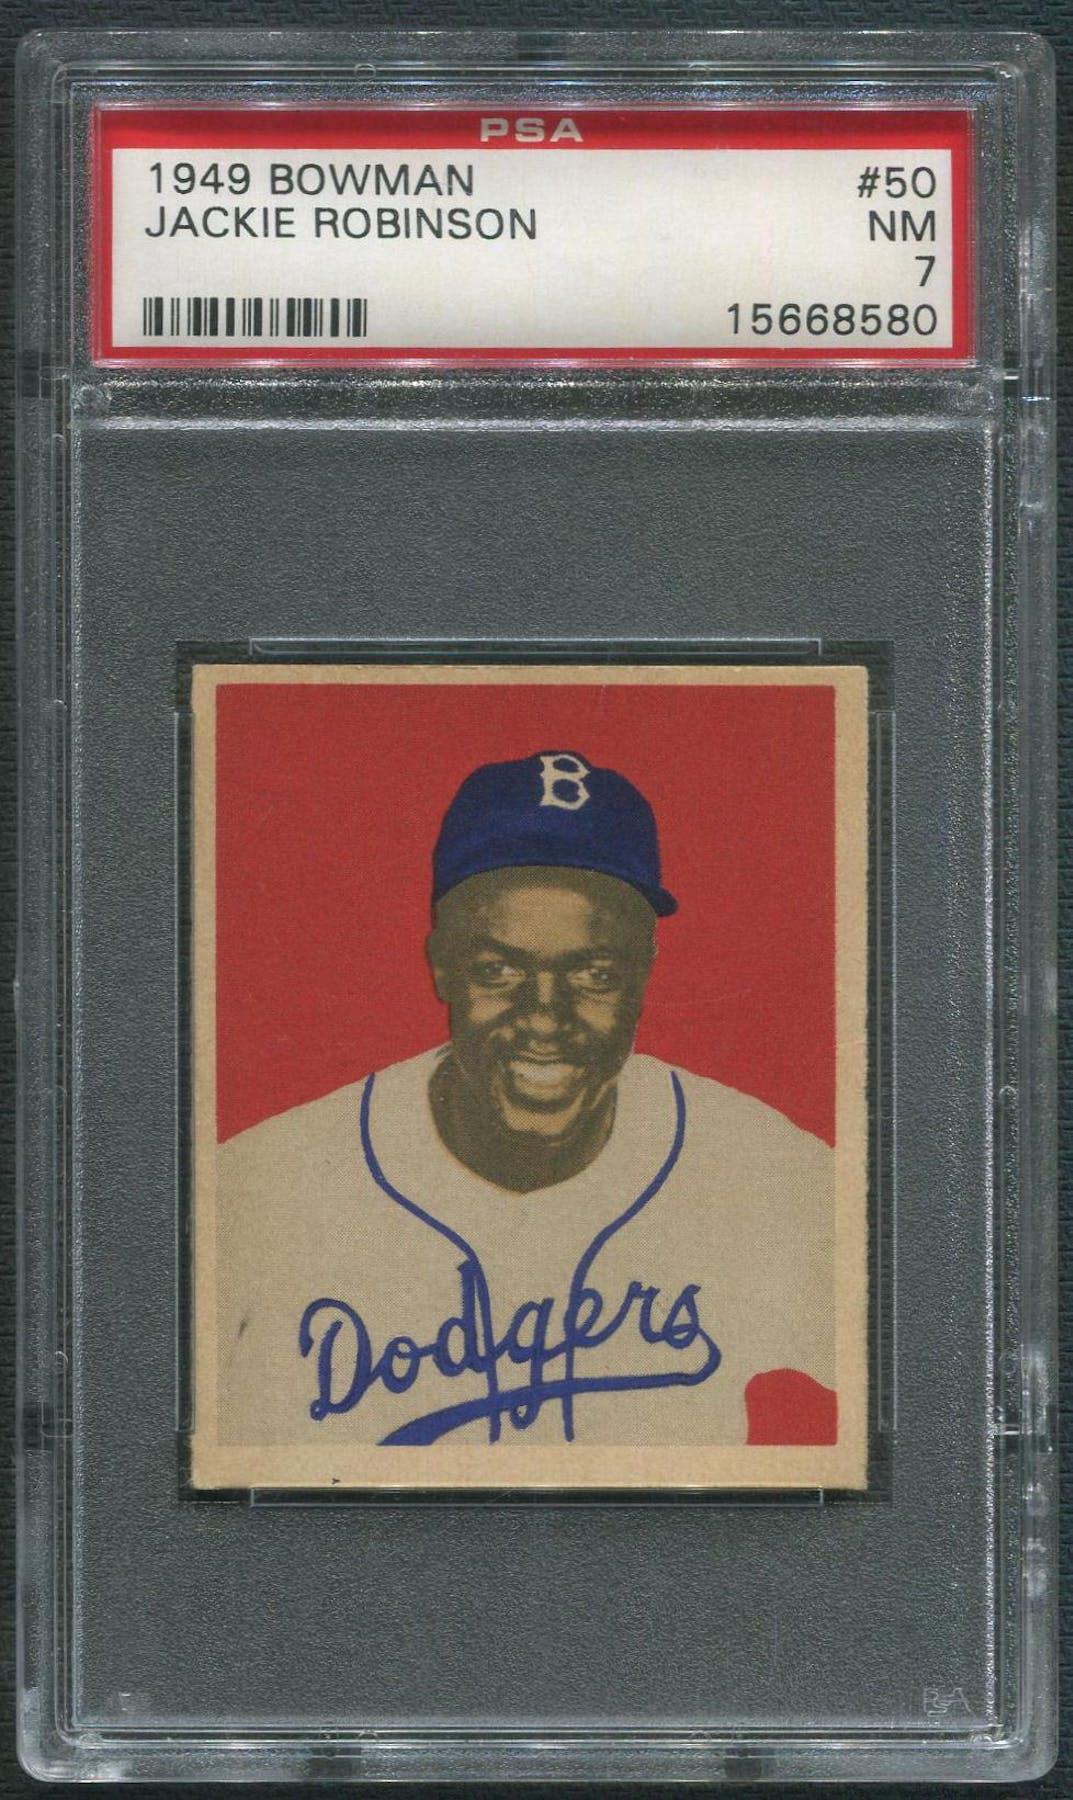 1949 Bowman Baseball 50 Jackie Robinson Rookie Psa 7 Nm